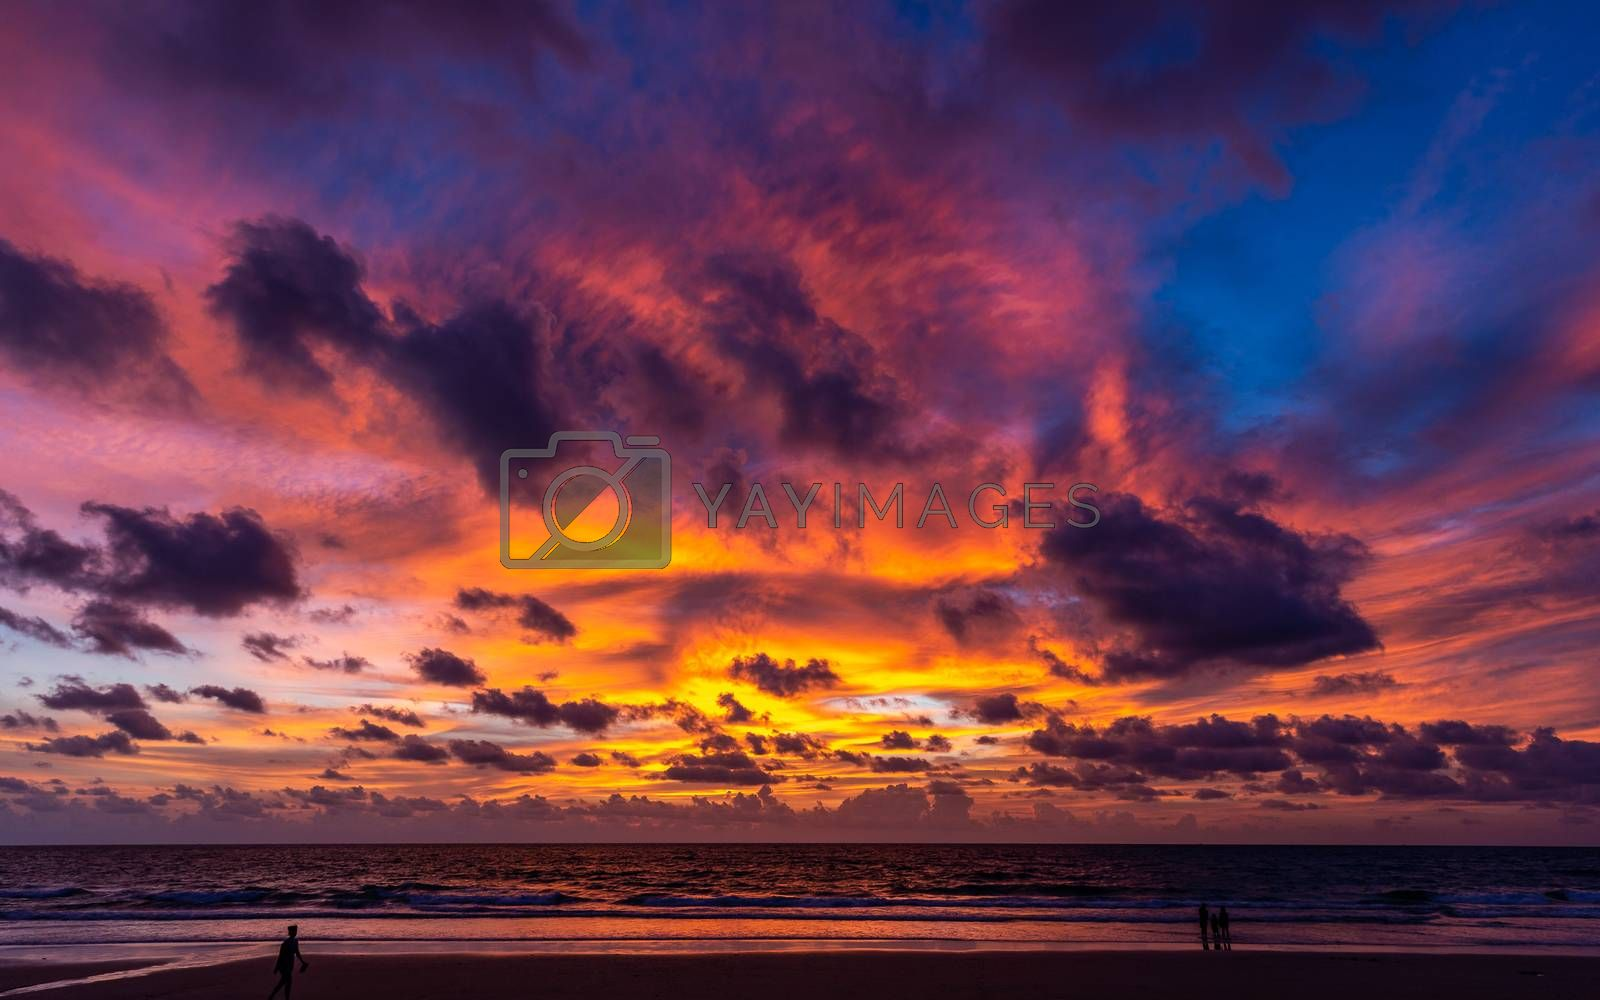 Dramatic twilight cloudy sky in rainy season at sunset over Phuket beach, Thailand.